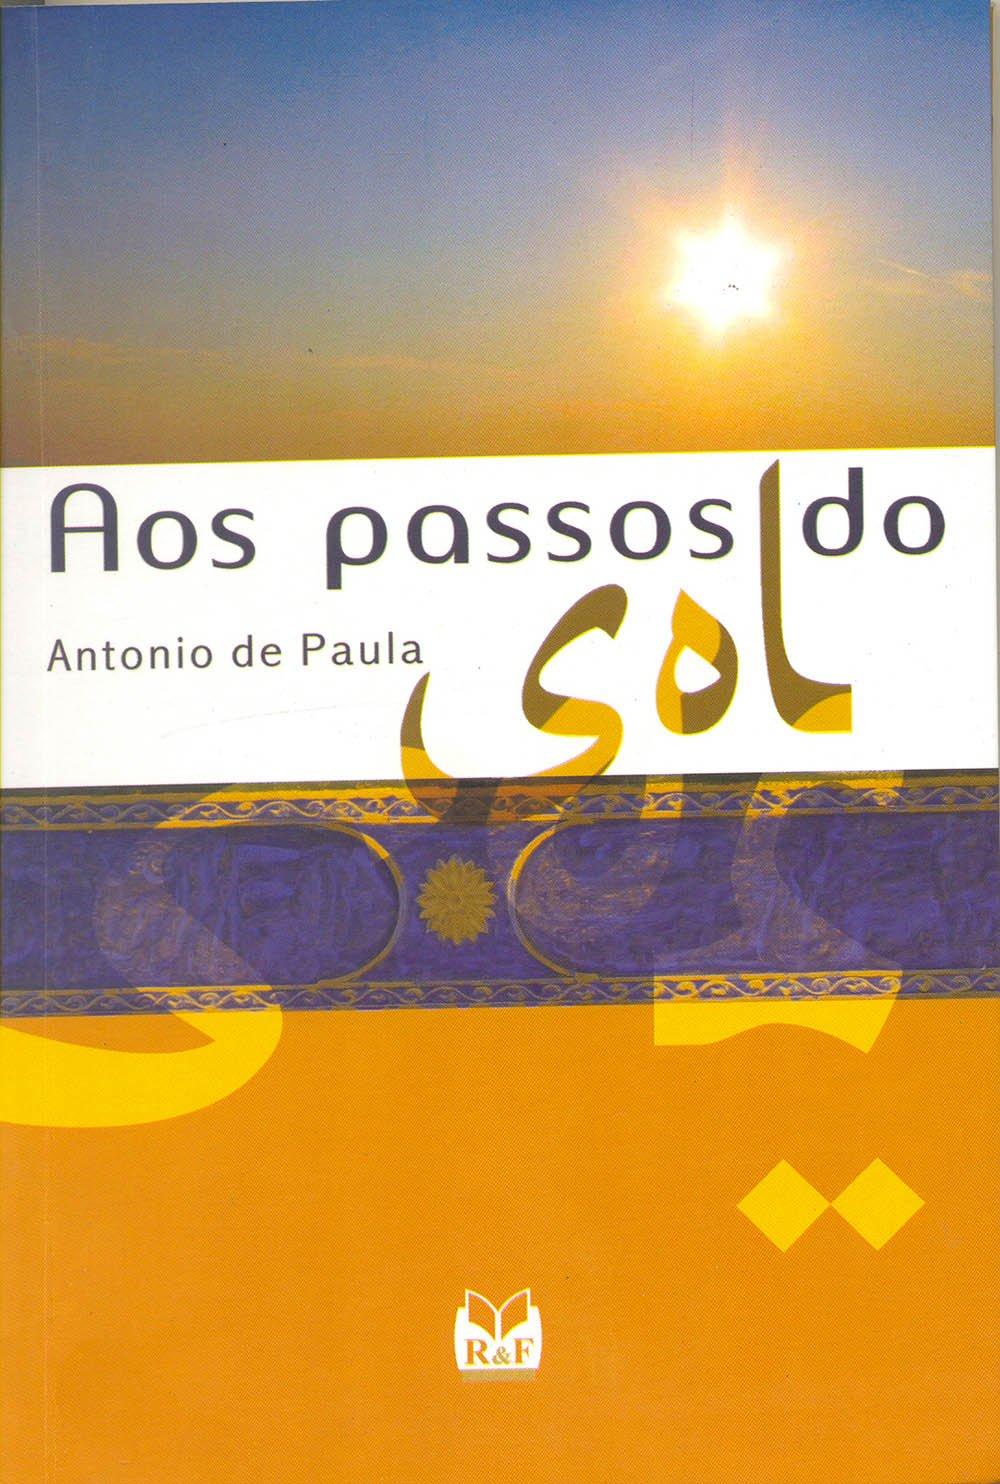 Download Tratados de Extradic~ao: Construc~ao, Atualidade E Projec~ao Do Relacionamento Bilateral Brasileiro PDF